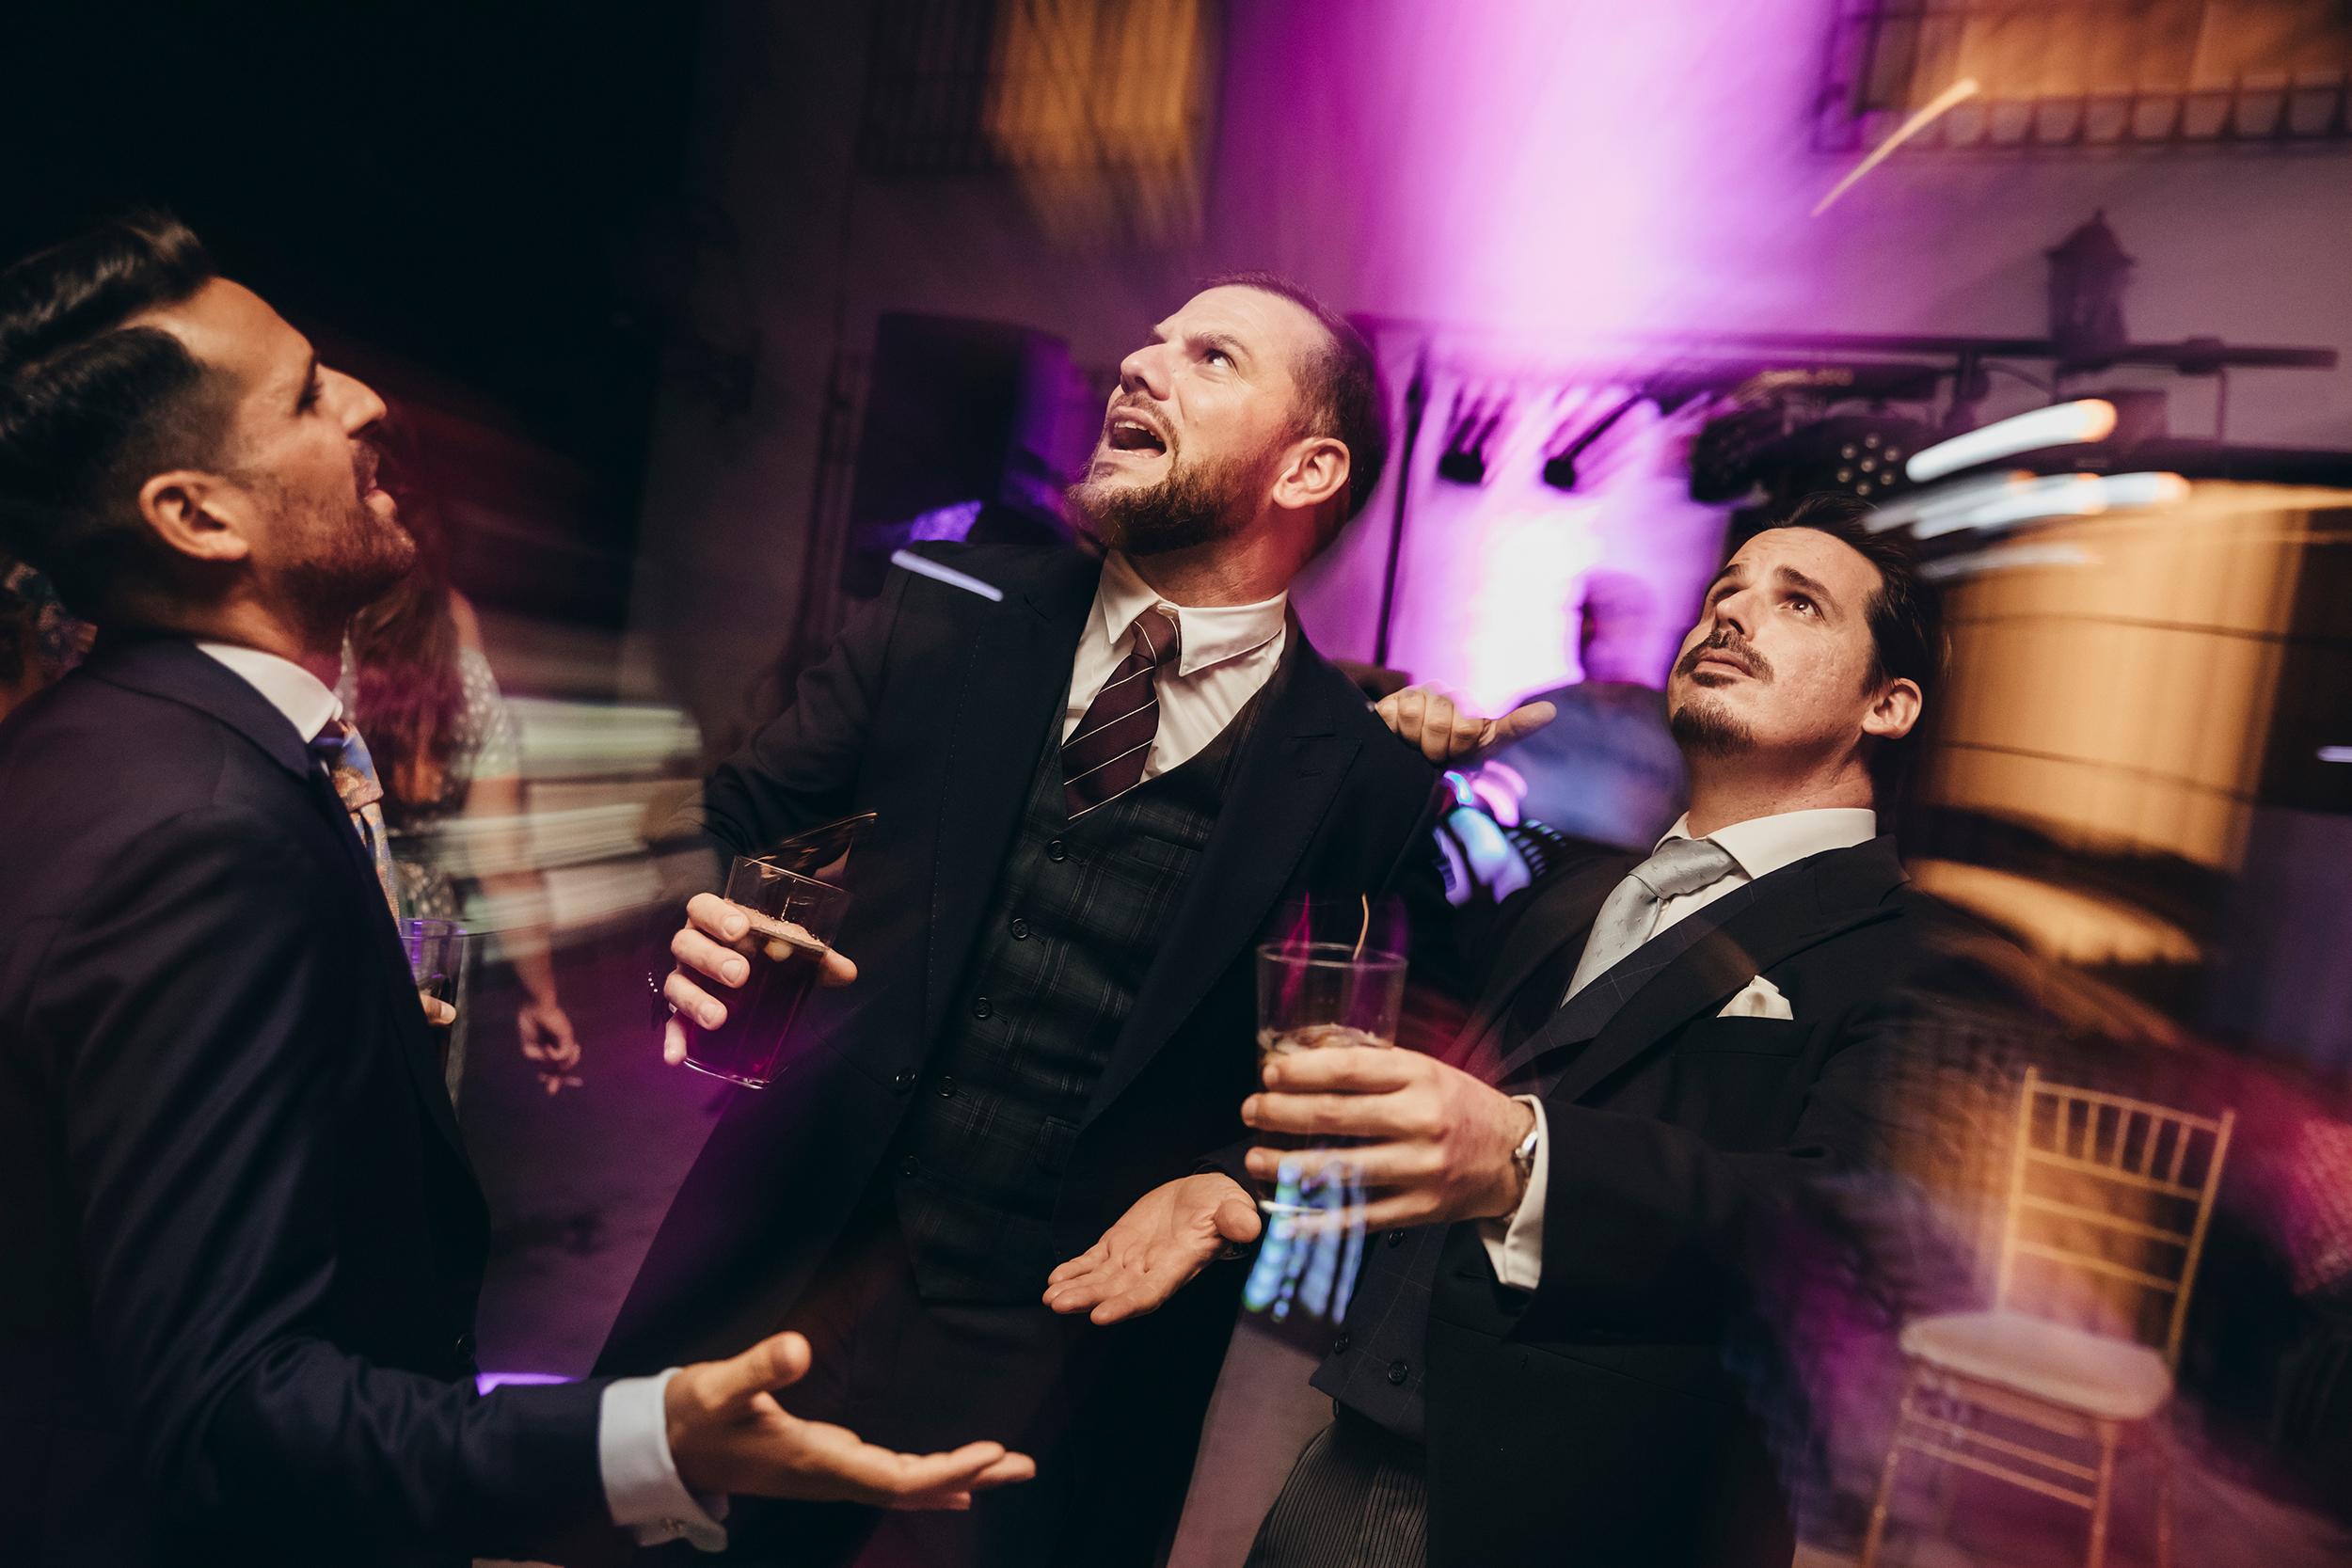 fotografo-bodas-granada-catedral-sagrario-jose-reyes_096.jpg